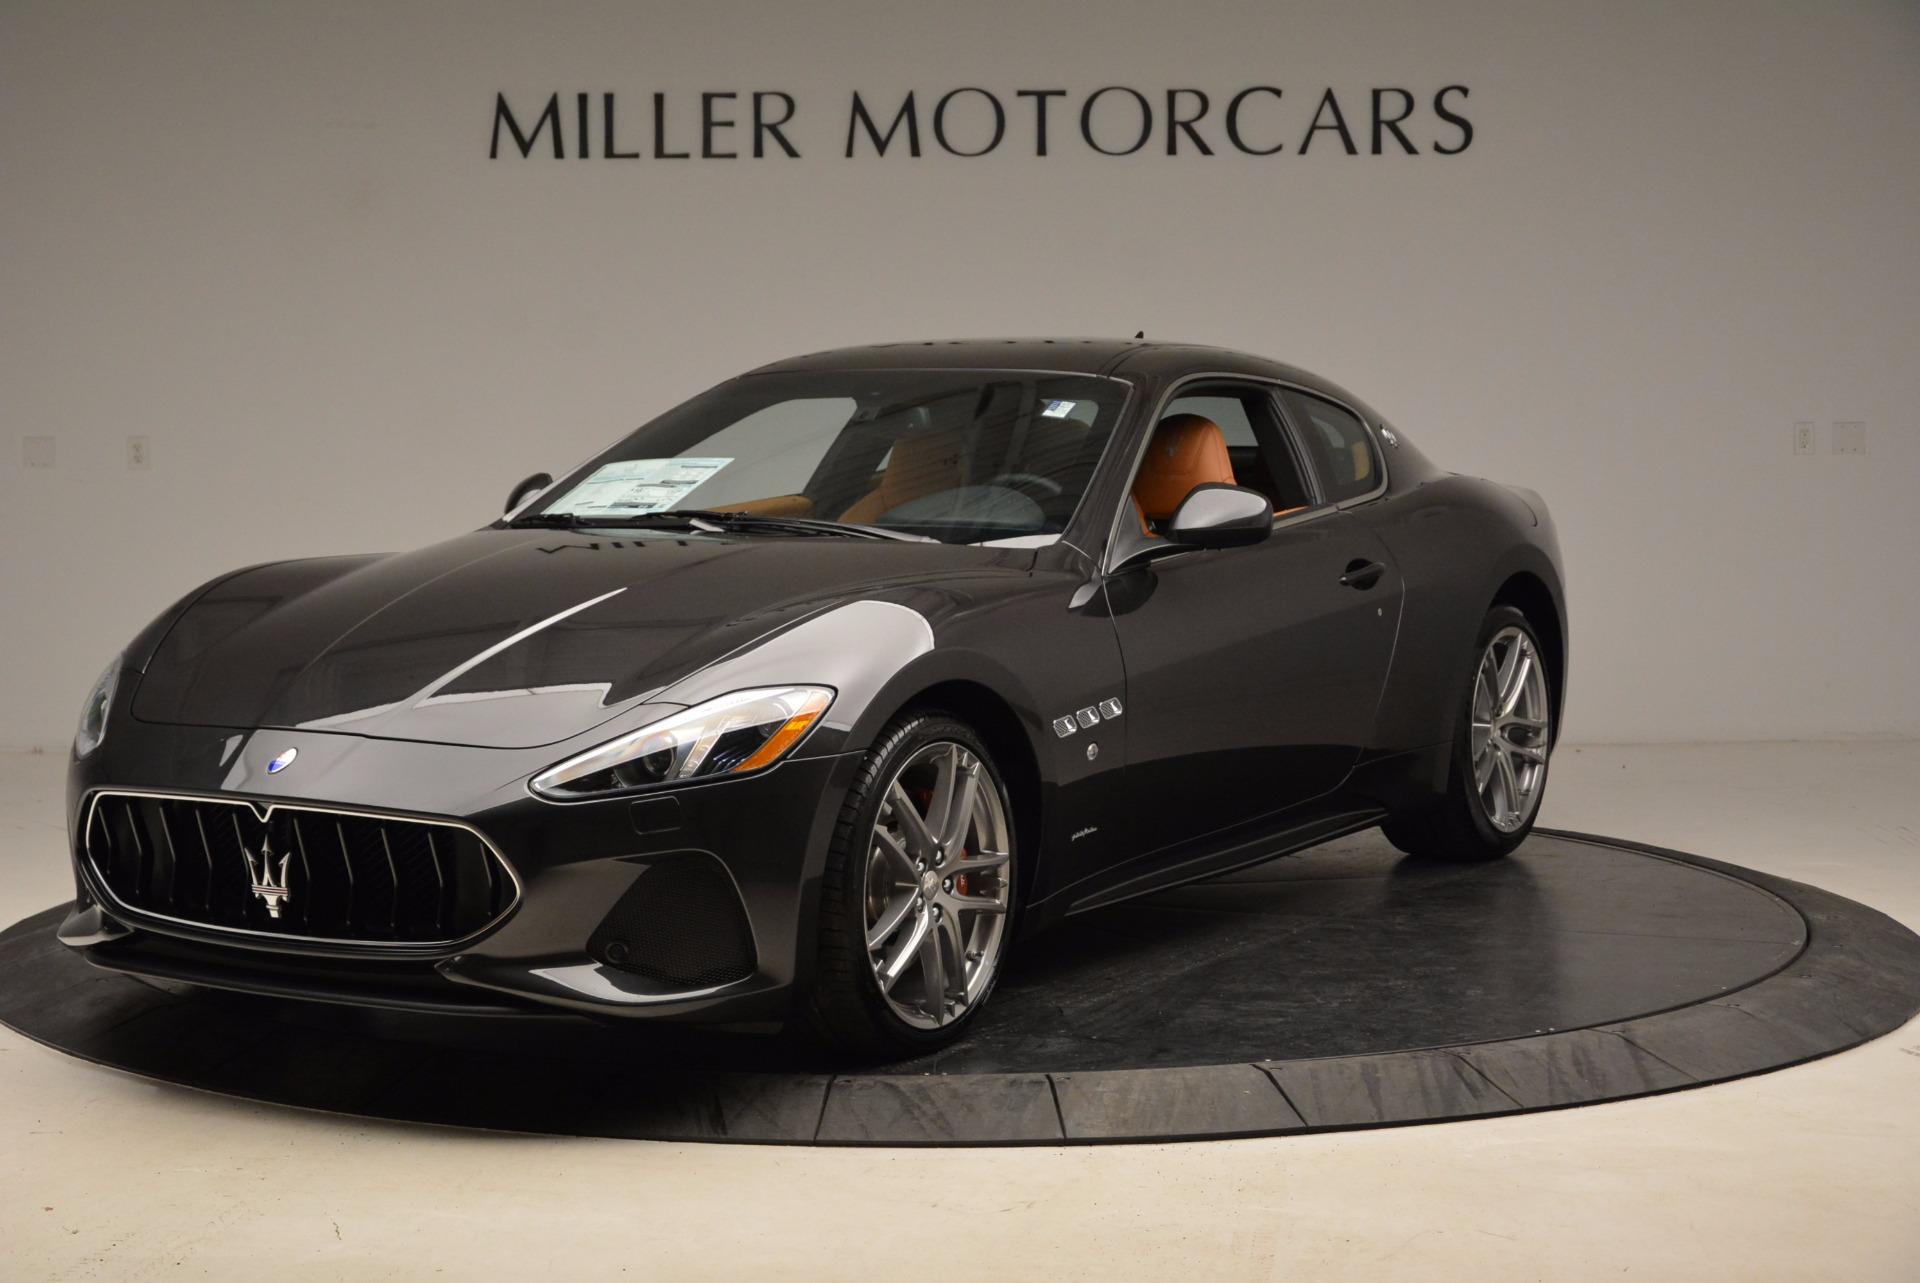 https://www.millermotorcars.com/galleria_images/1771/1771_main_l.jpg